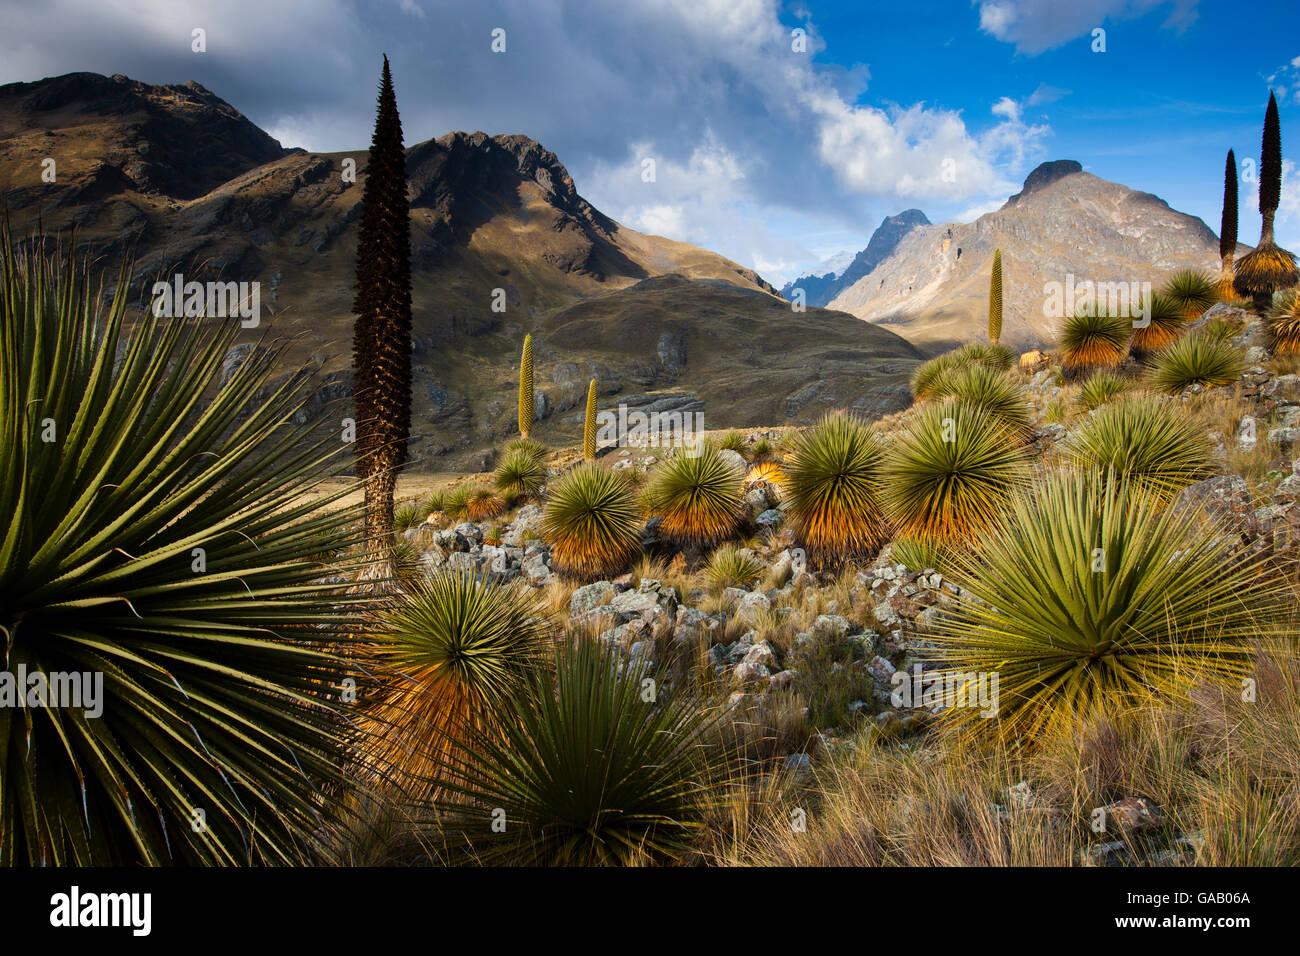 Queen of the Andes (Puya raymondii) Cordillera Blanca Massif, Andes, Peru, November. Stock Photo